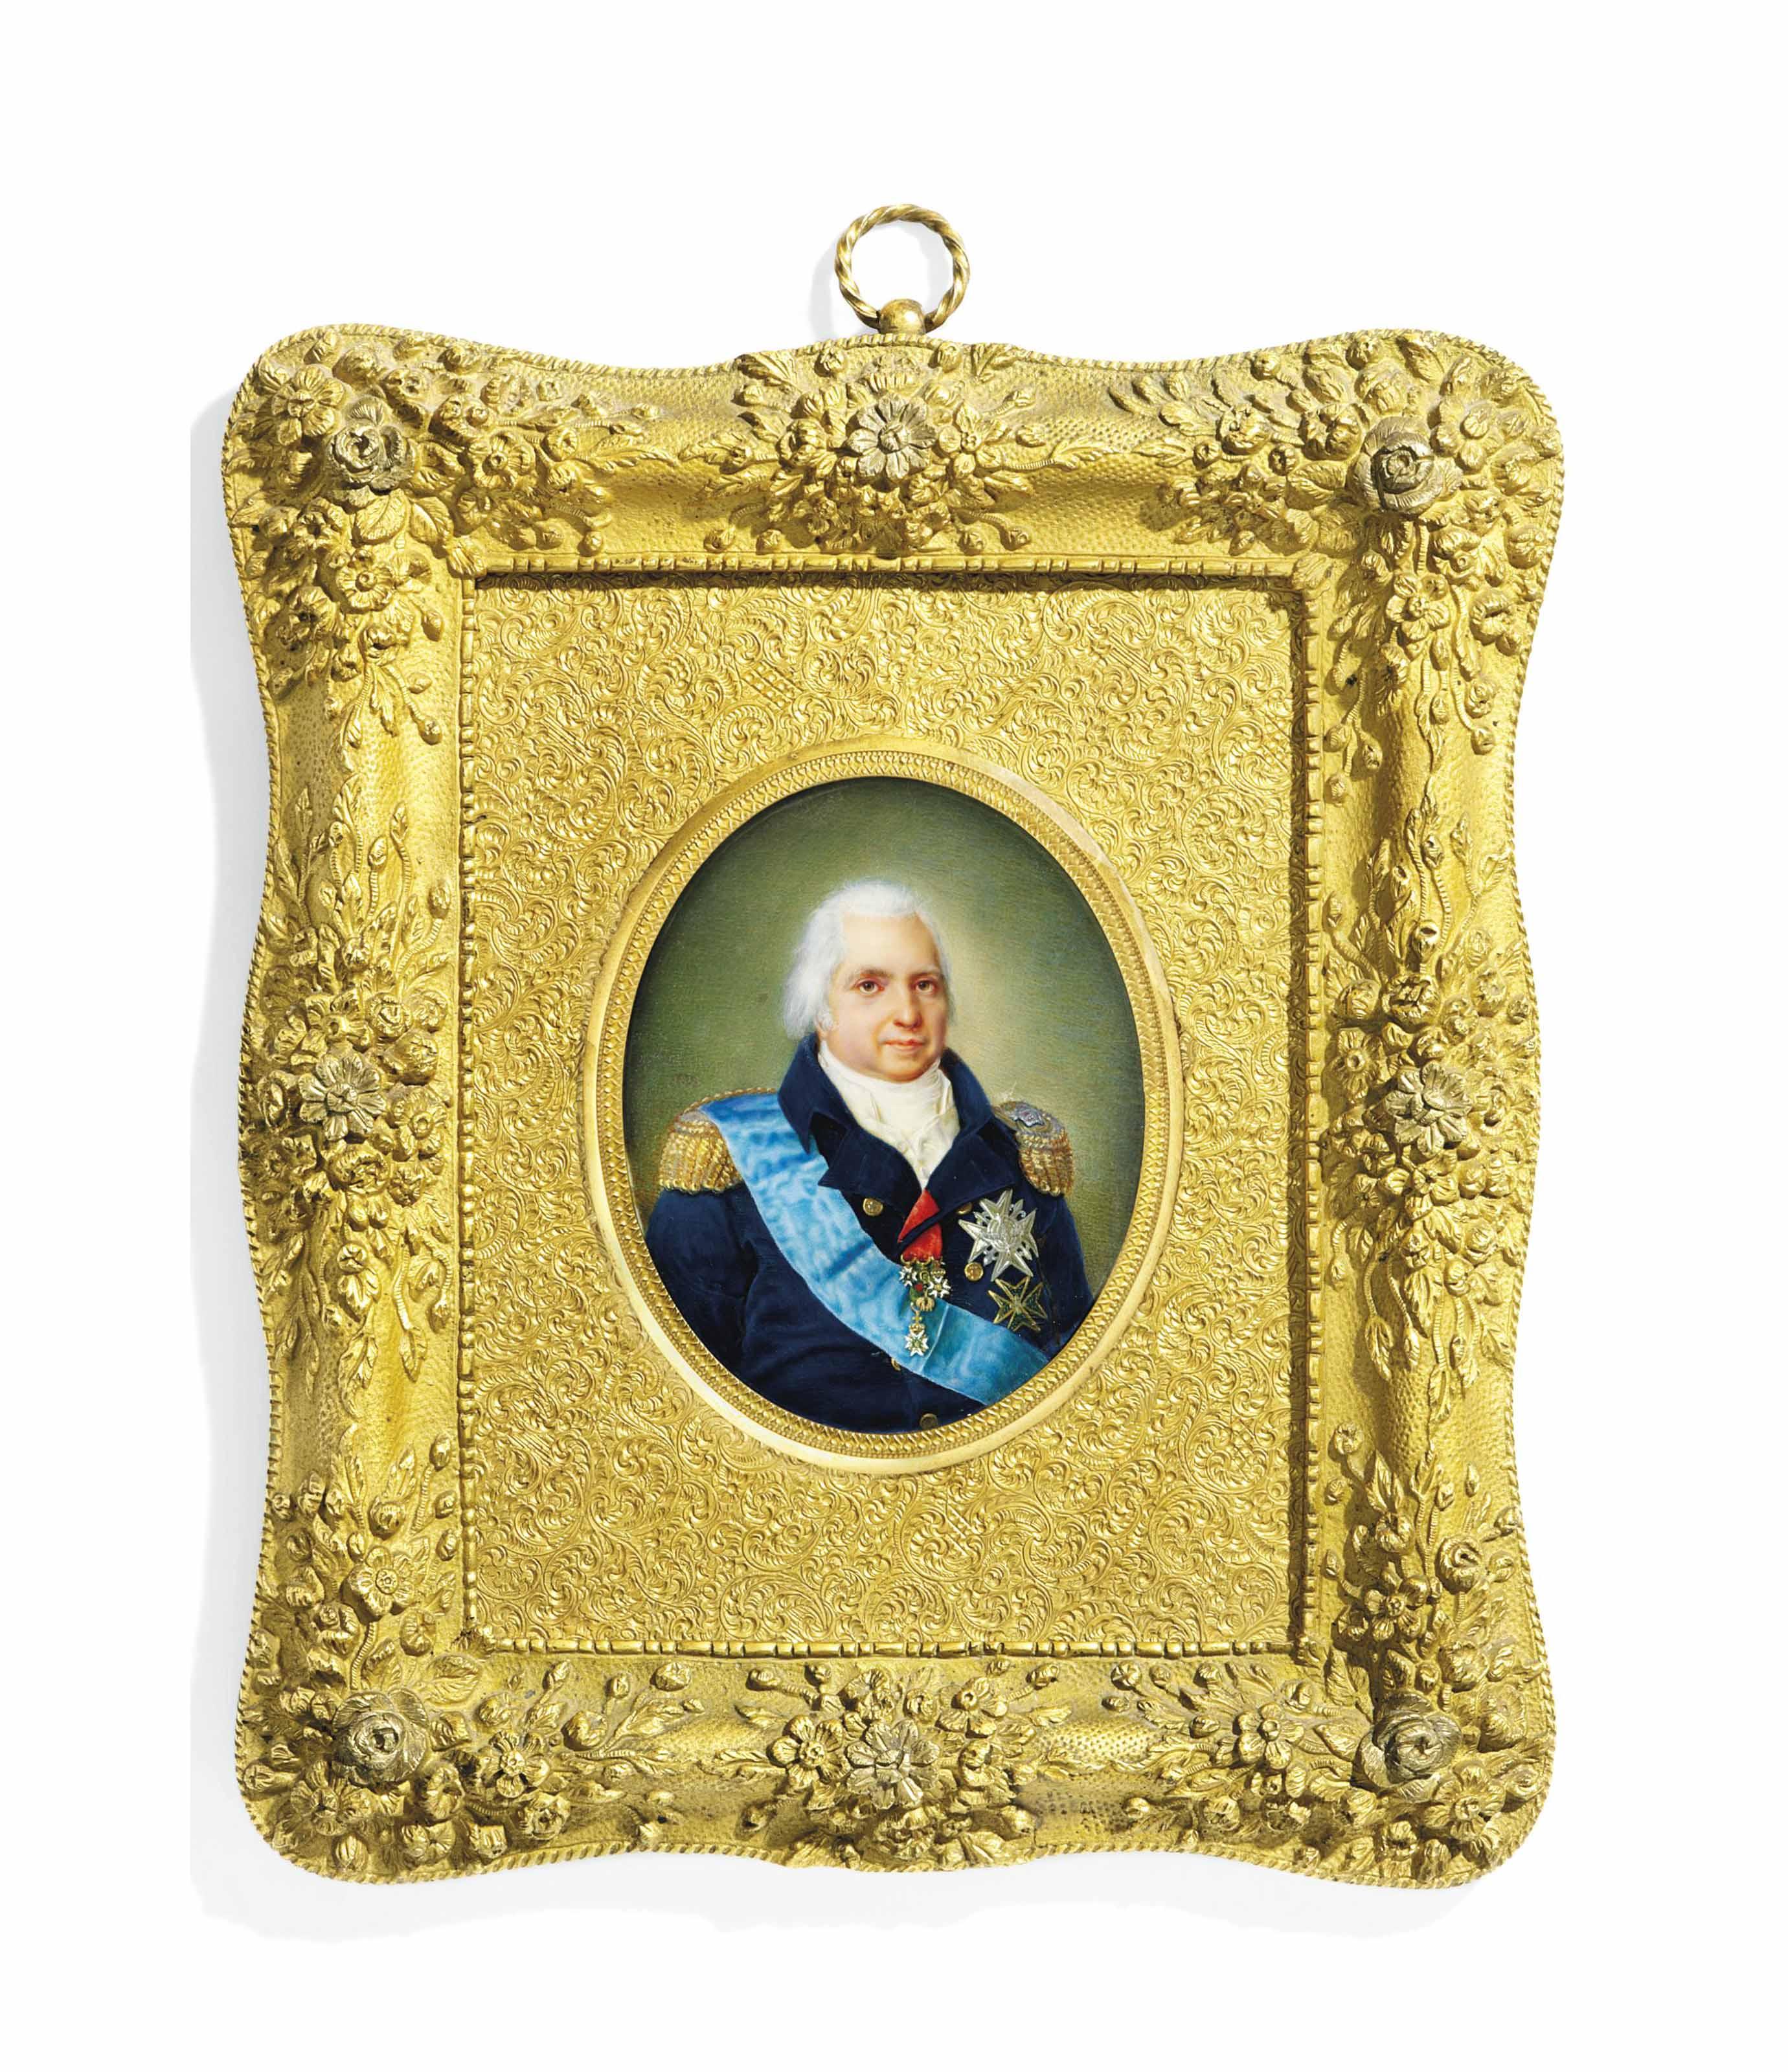 AIMEE-ZOE LIZINKA DE MIRBEL, NEE RUE (FRENCH, 1796-1849)